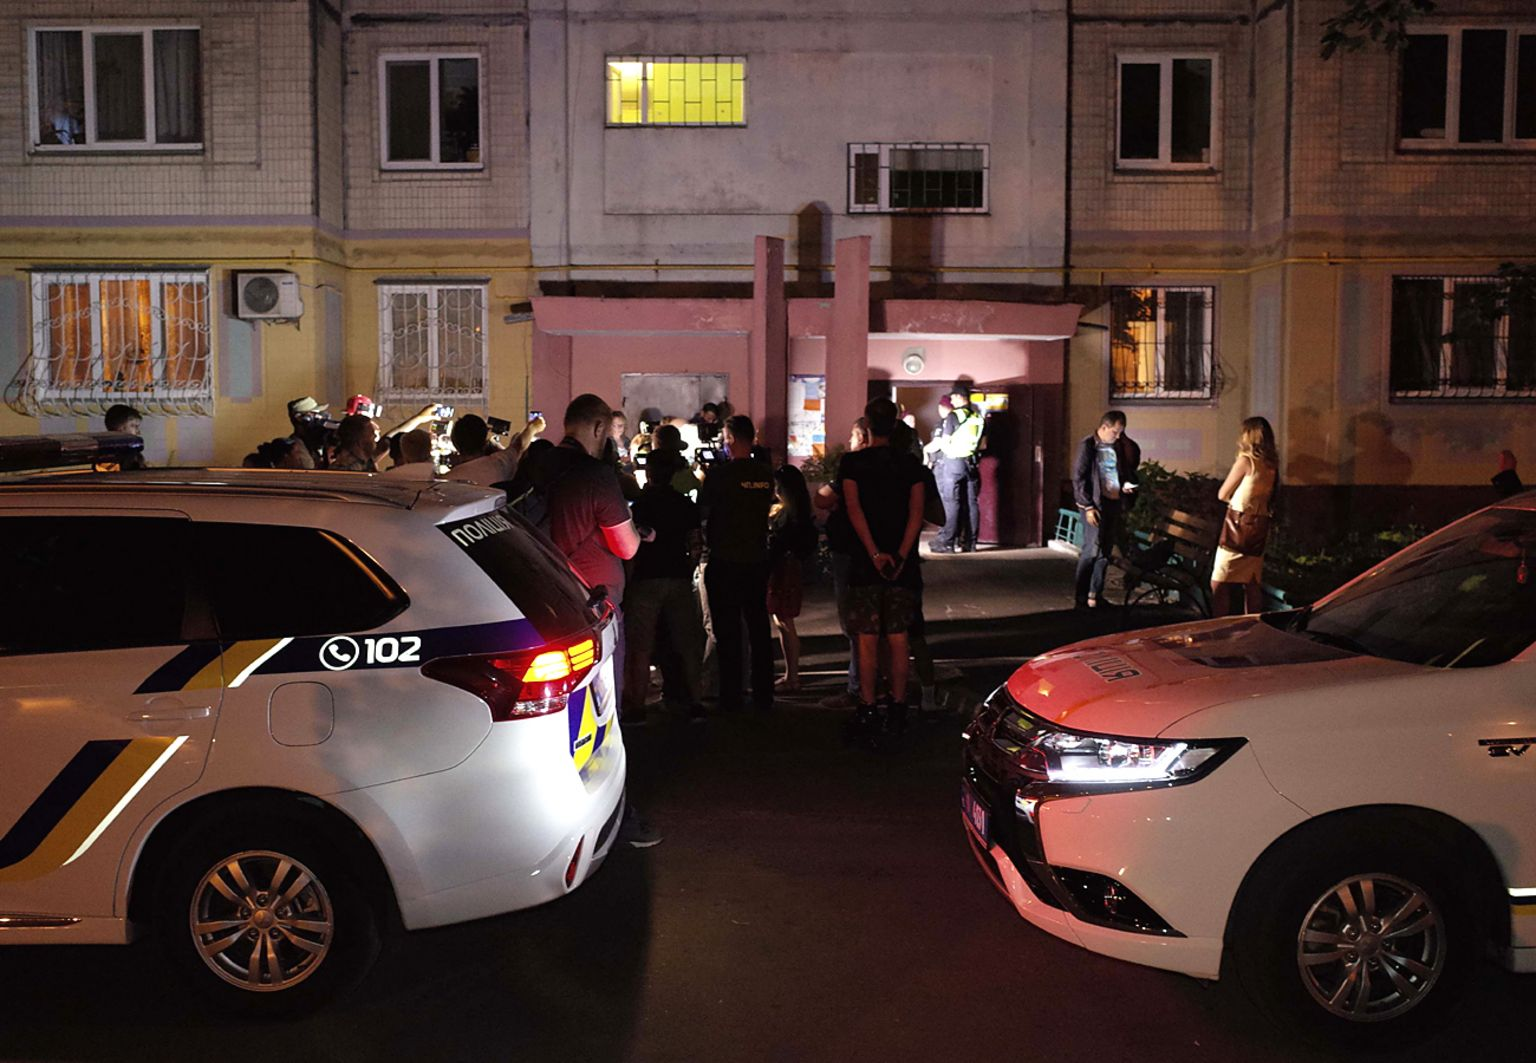 Outside the Babchenkos' apartment